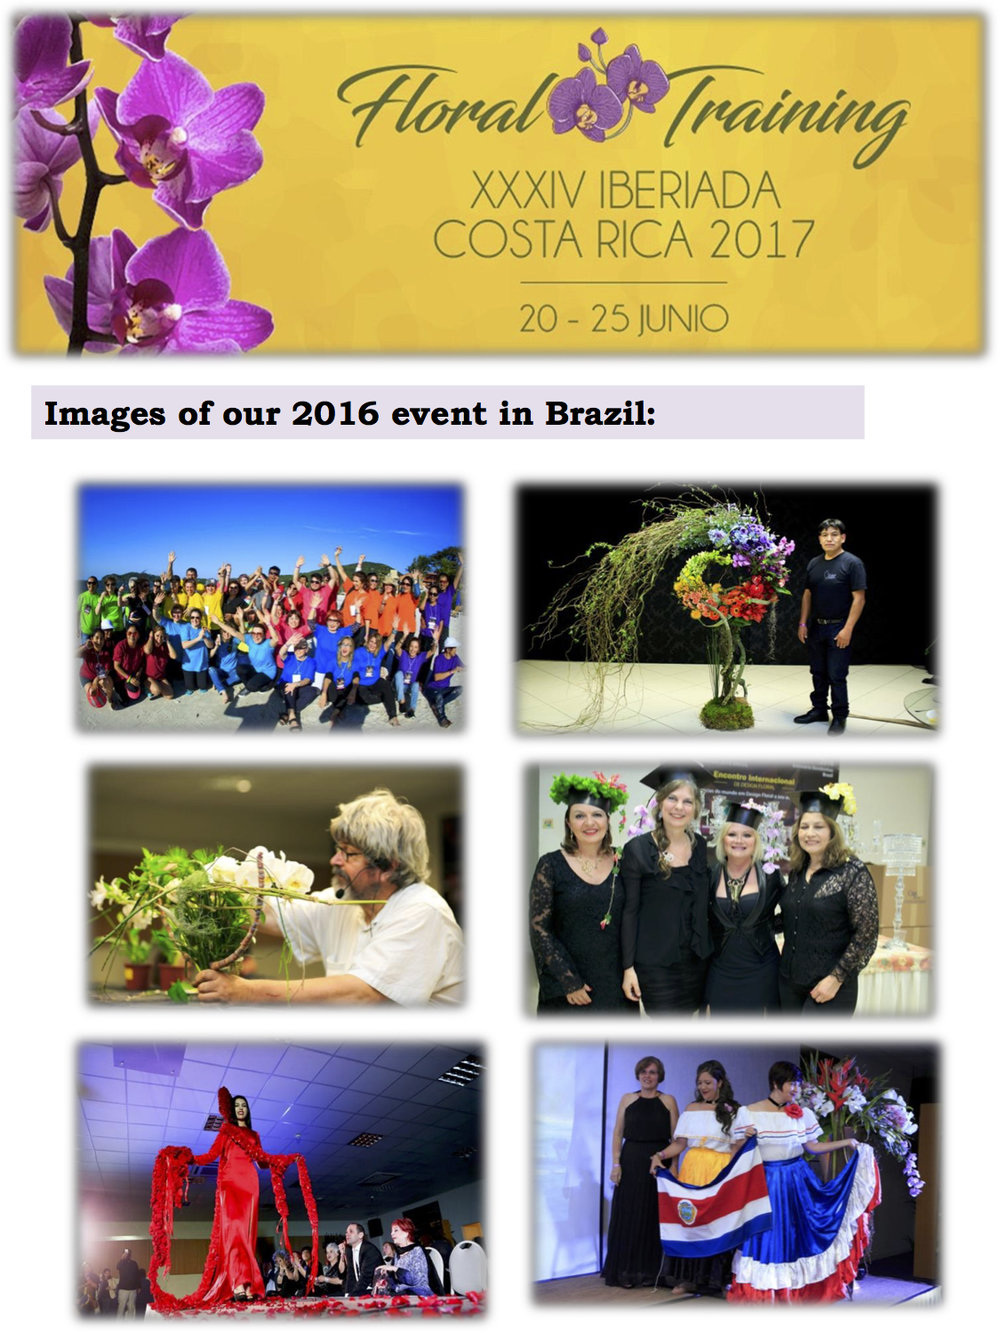 Floral Training - XXXIV Iberiada Costa Rica 2017 (English) 10.jpg